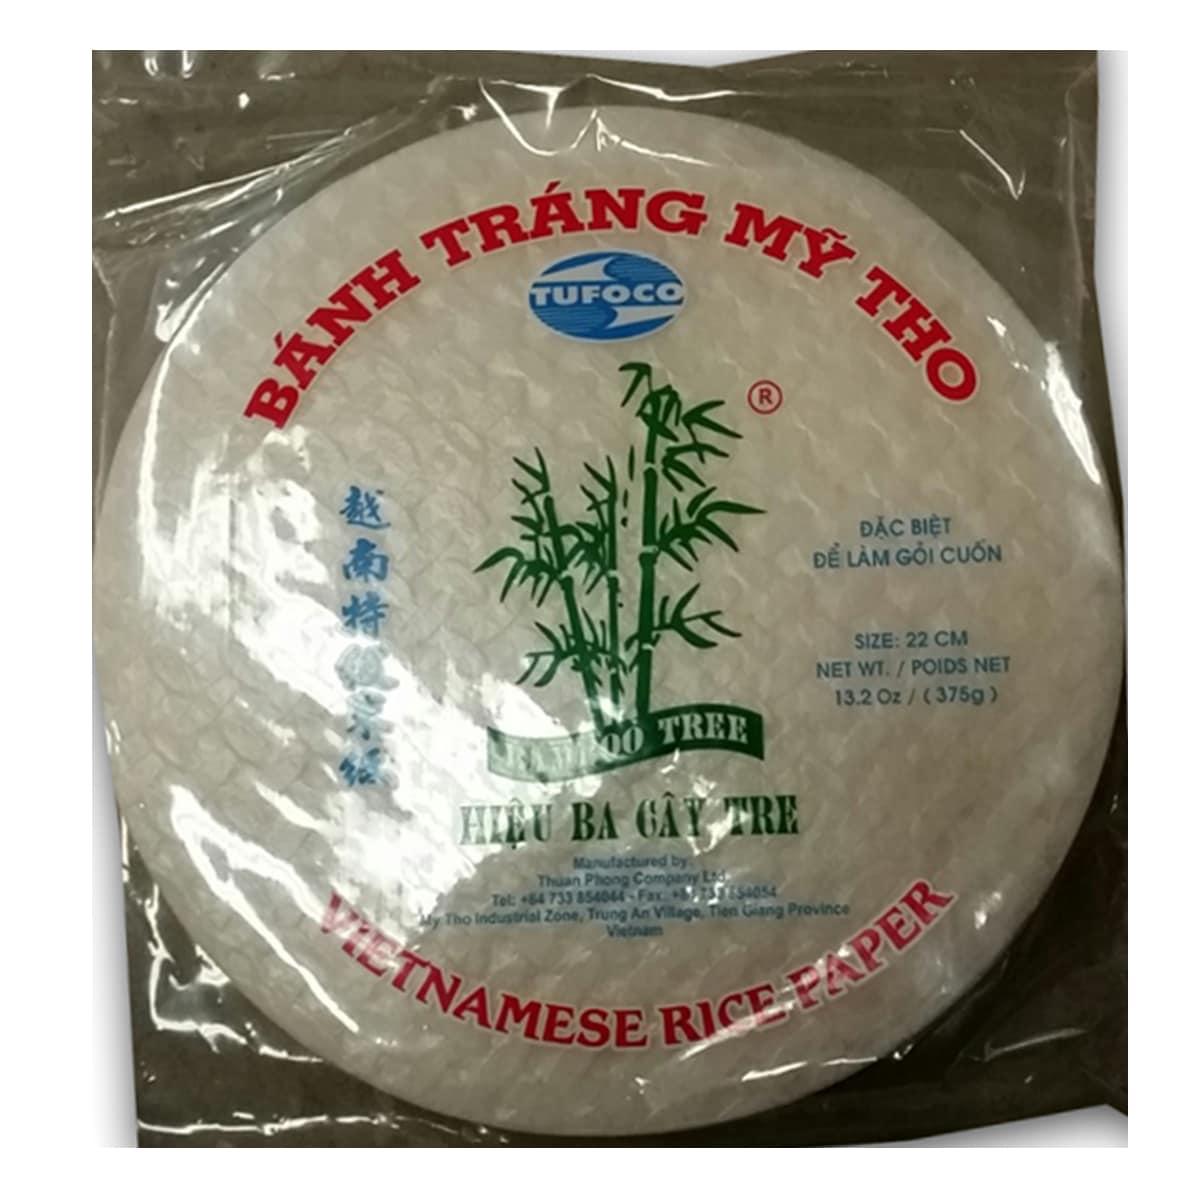 Buy Tufoco Vietanmese Rice Paper 22cm - 375 gm